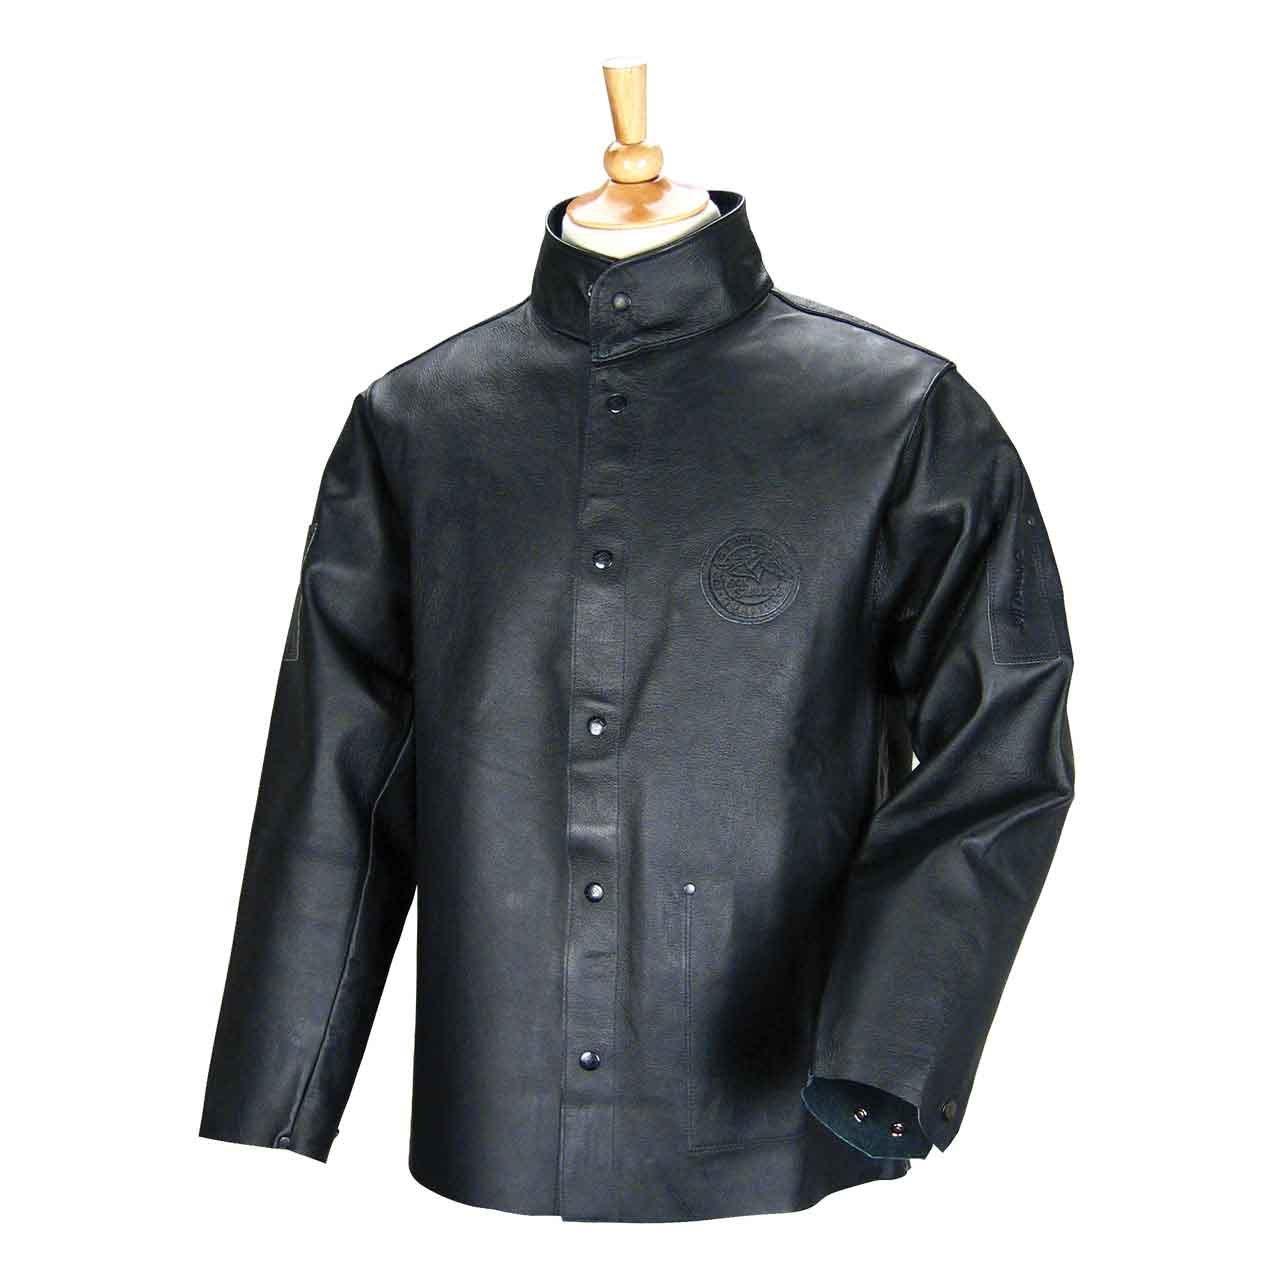 DuraLite Premium Grain Pigskin Welding Coat - 30'' (Black, Size X-Large)